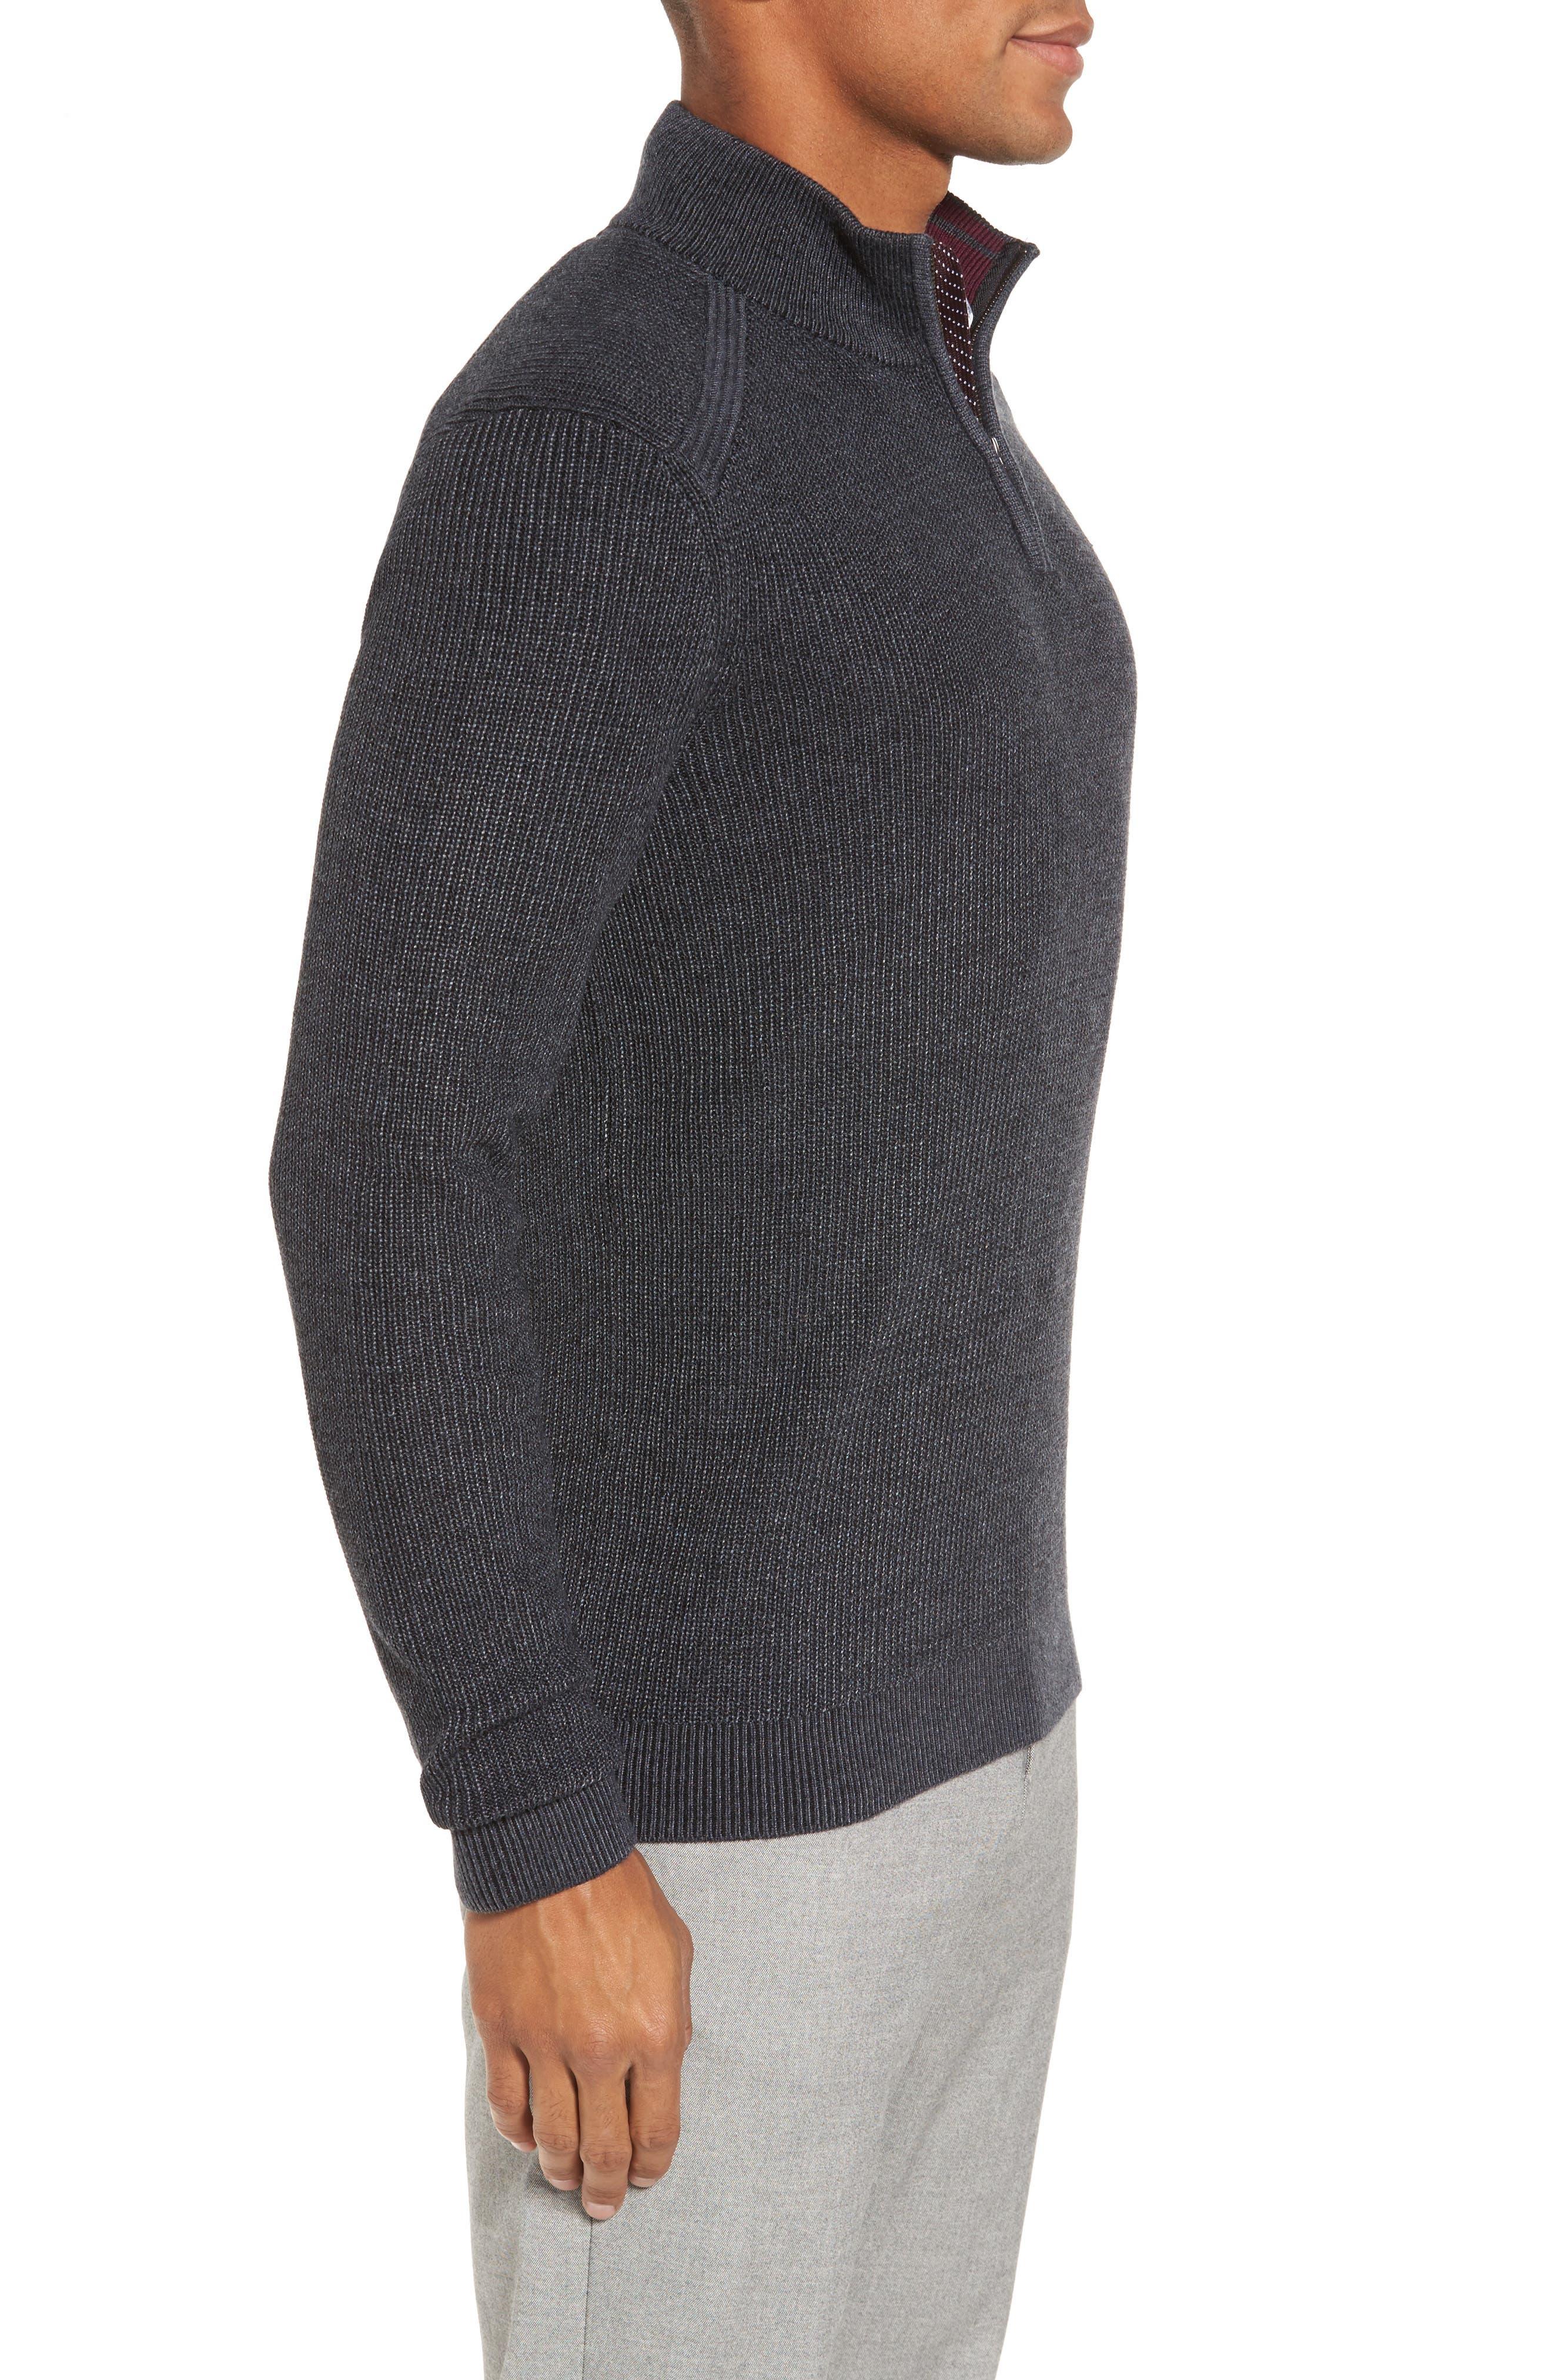 Alternate Image 3  - Ted Baker London Slim Fit Quarter Zip Sweater (Tall)